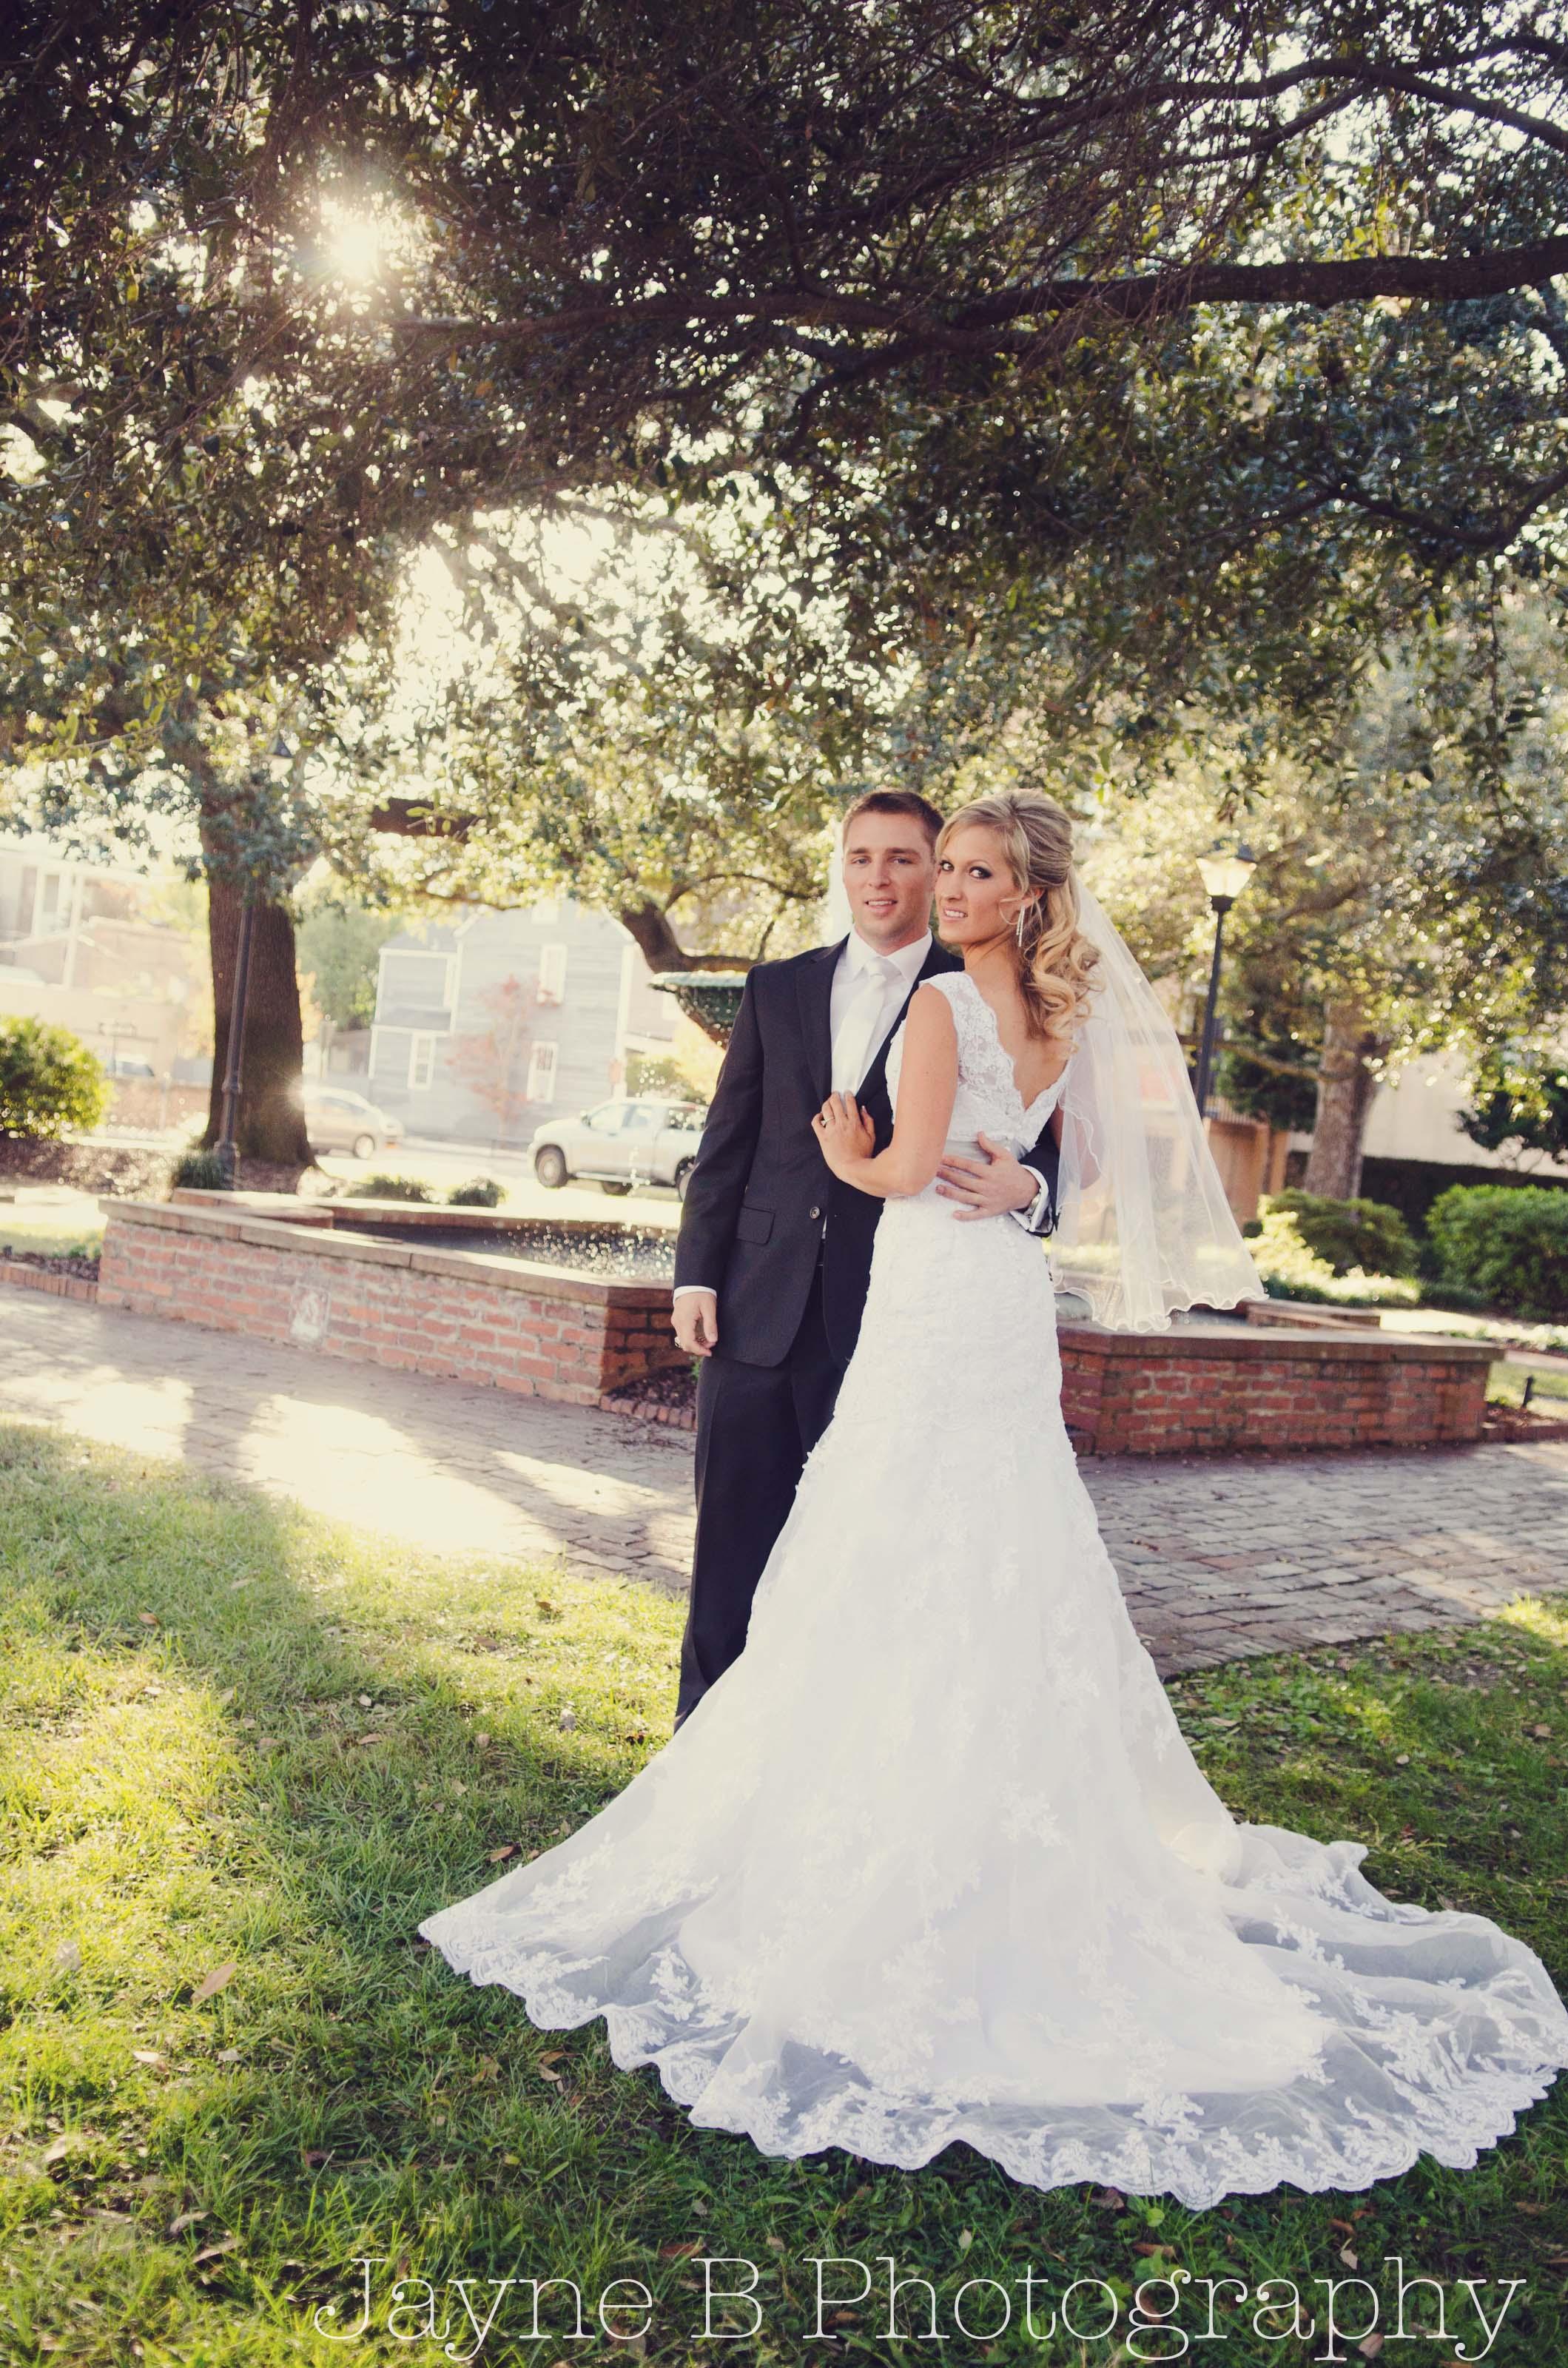 Savannah and wedding on pinterest for Wedding dress savannah ga